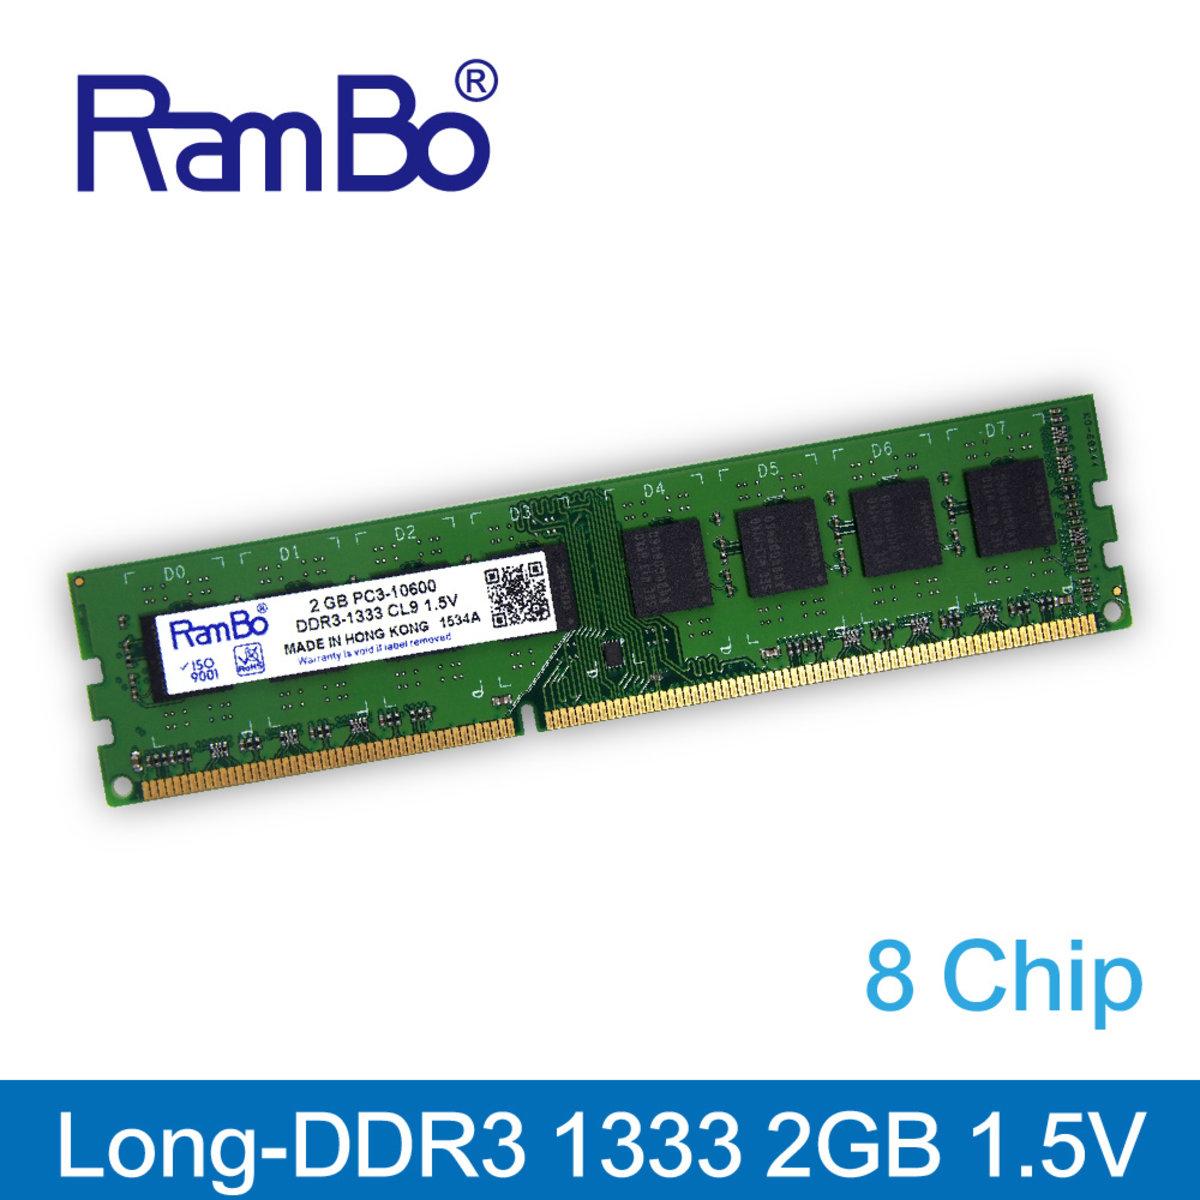 2GB DDR3 1333MHz Long DIMM 8-Chip 1.5V Memory for PC Desktop